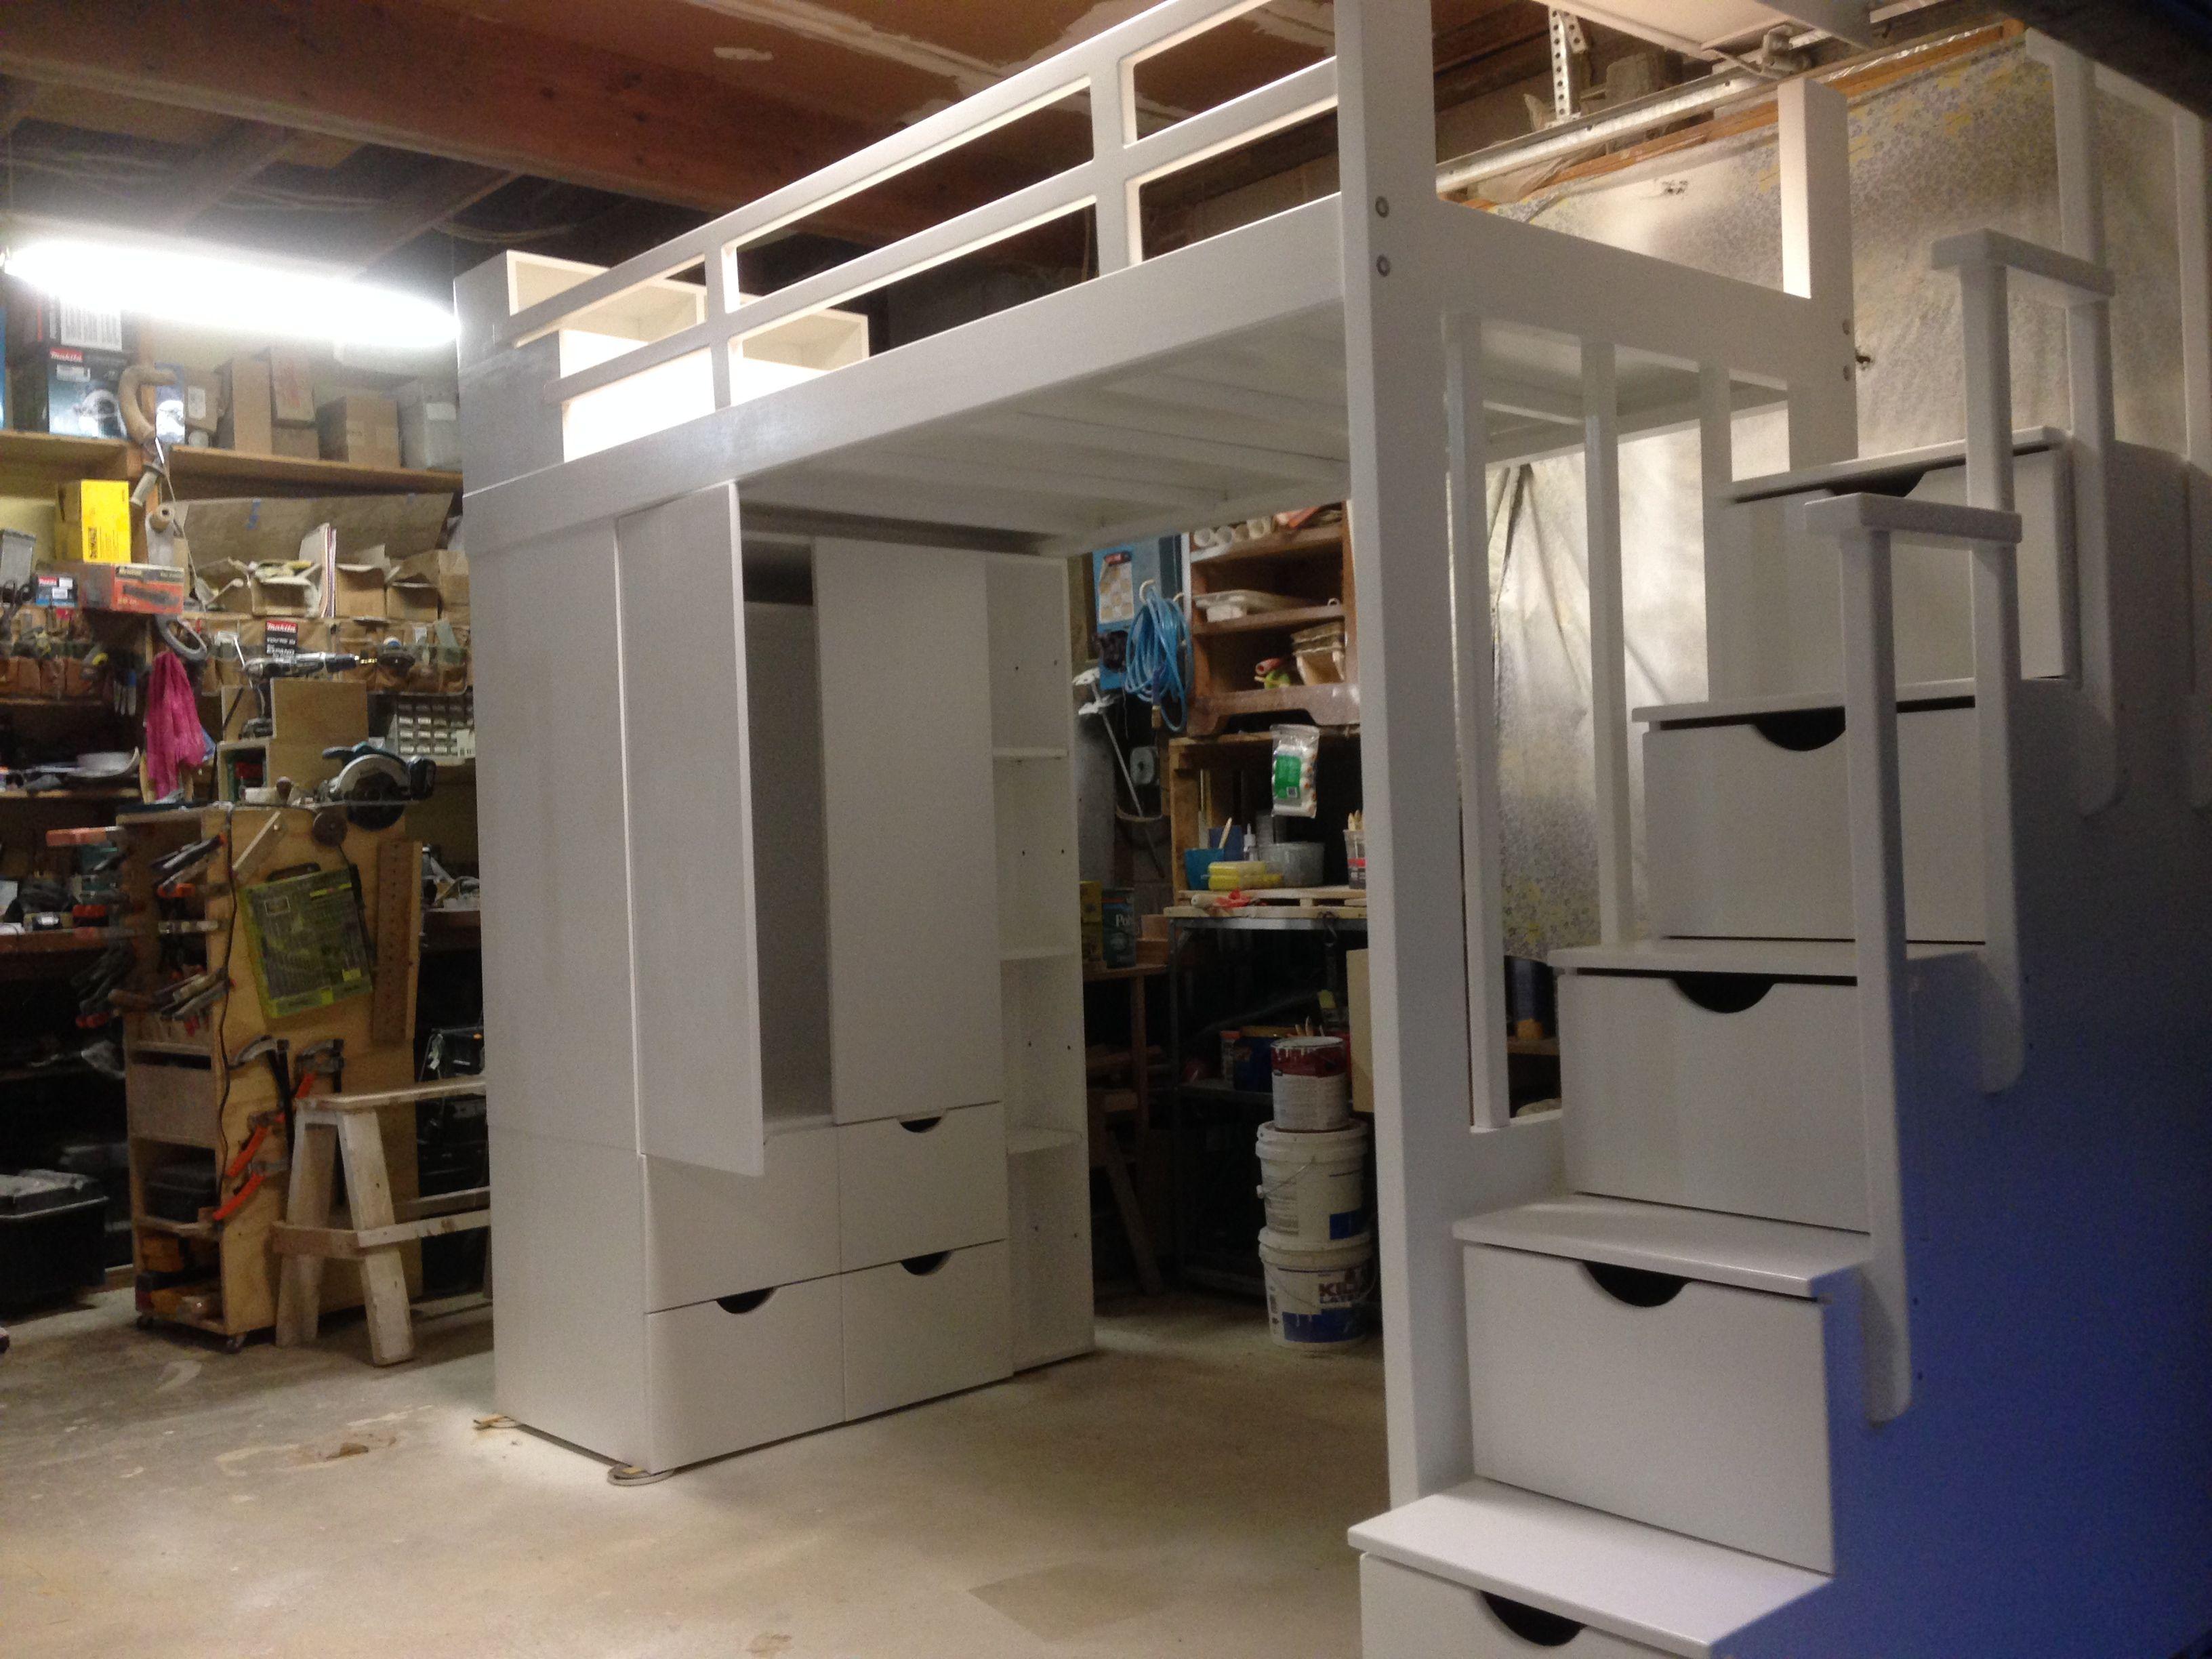 Wardrobe loft bed with storage steps | Laval Custom Lofts ...